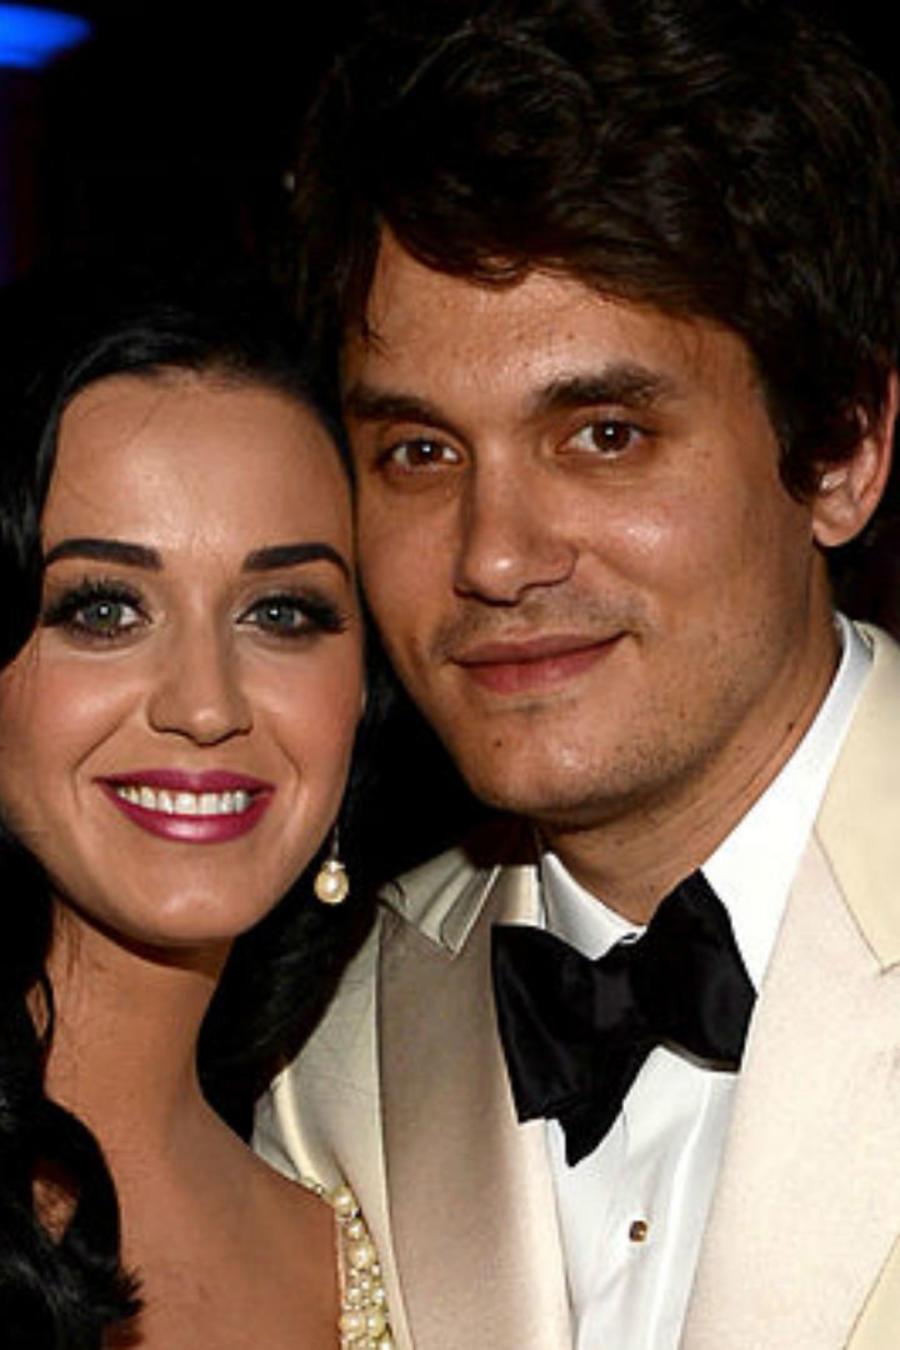 John Mayer y Katy Perry abrazados